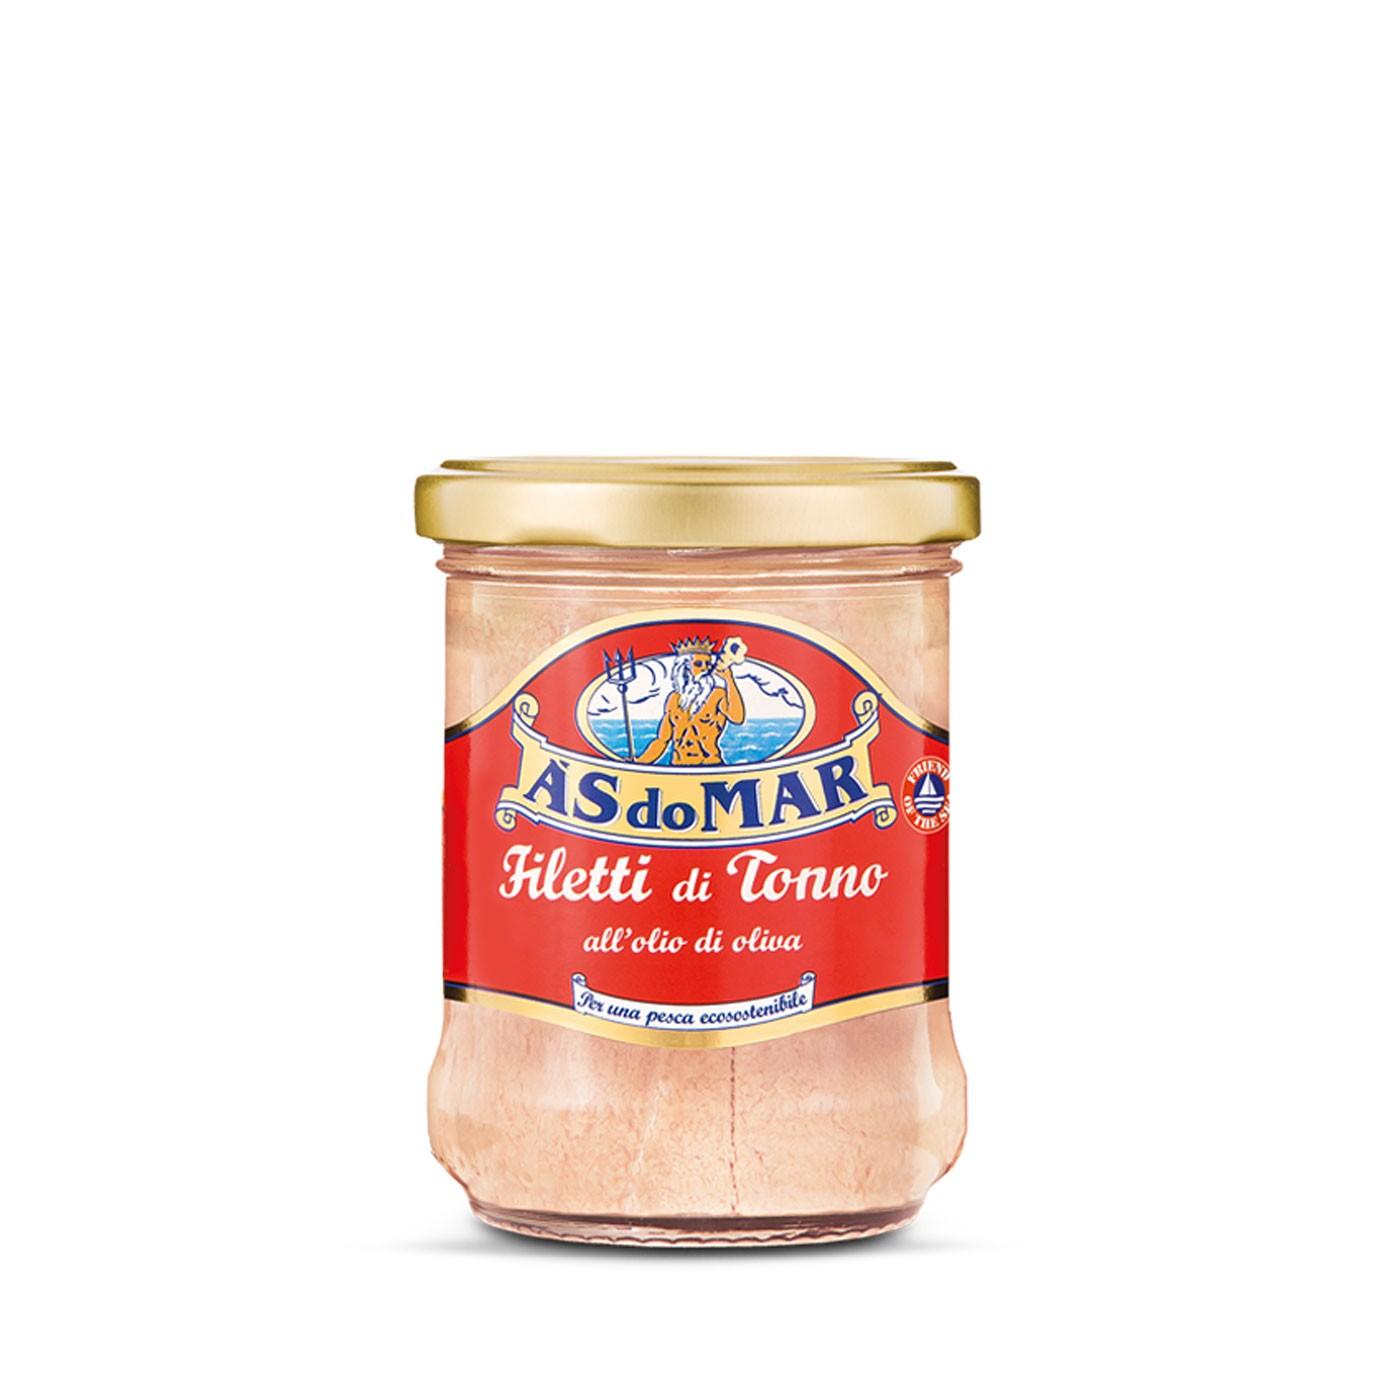 Tuna Fillets in Olive Oil - Jar 7.05 oz